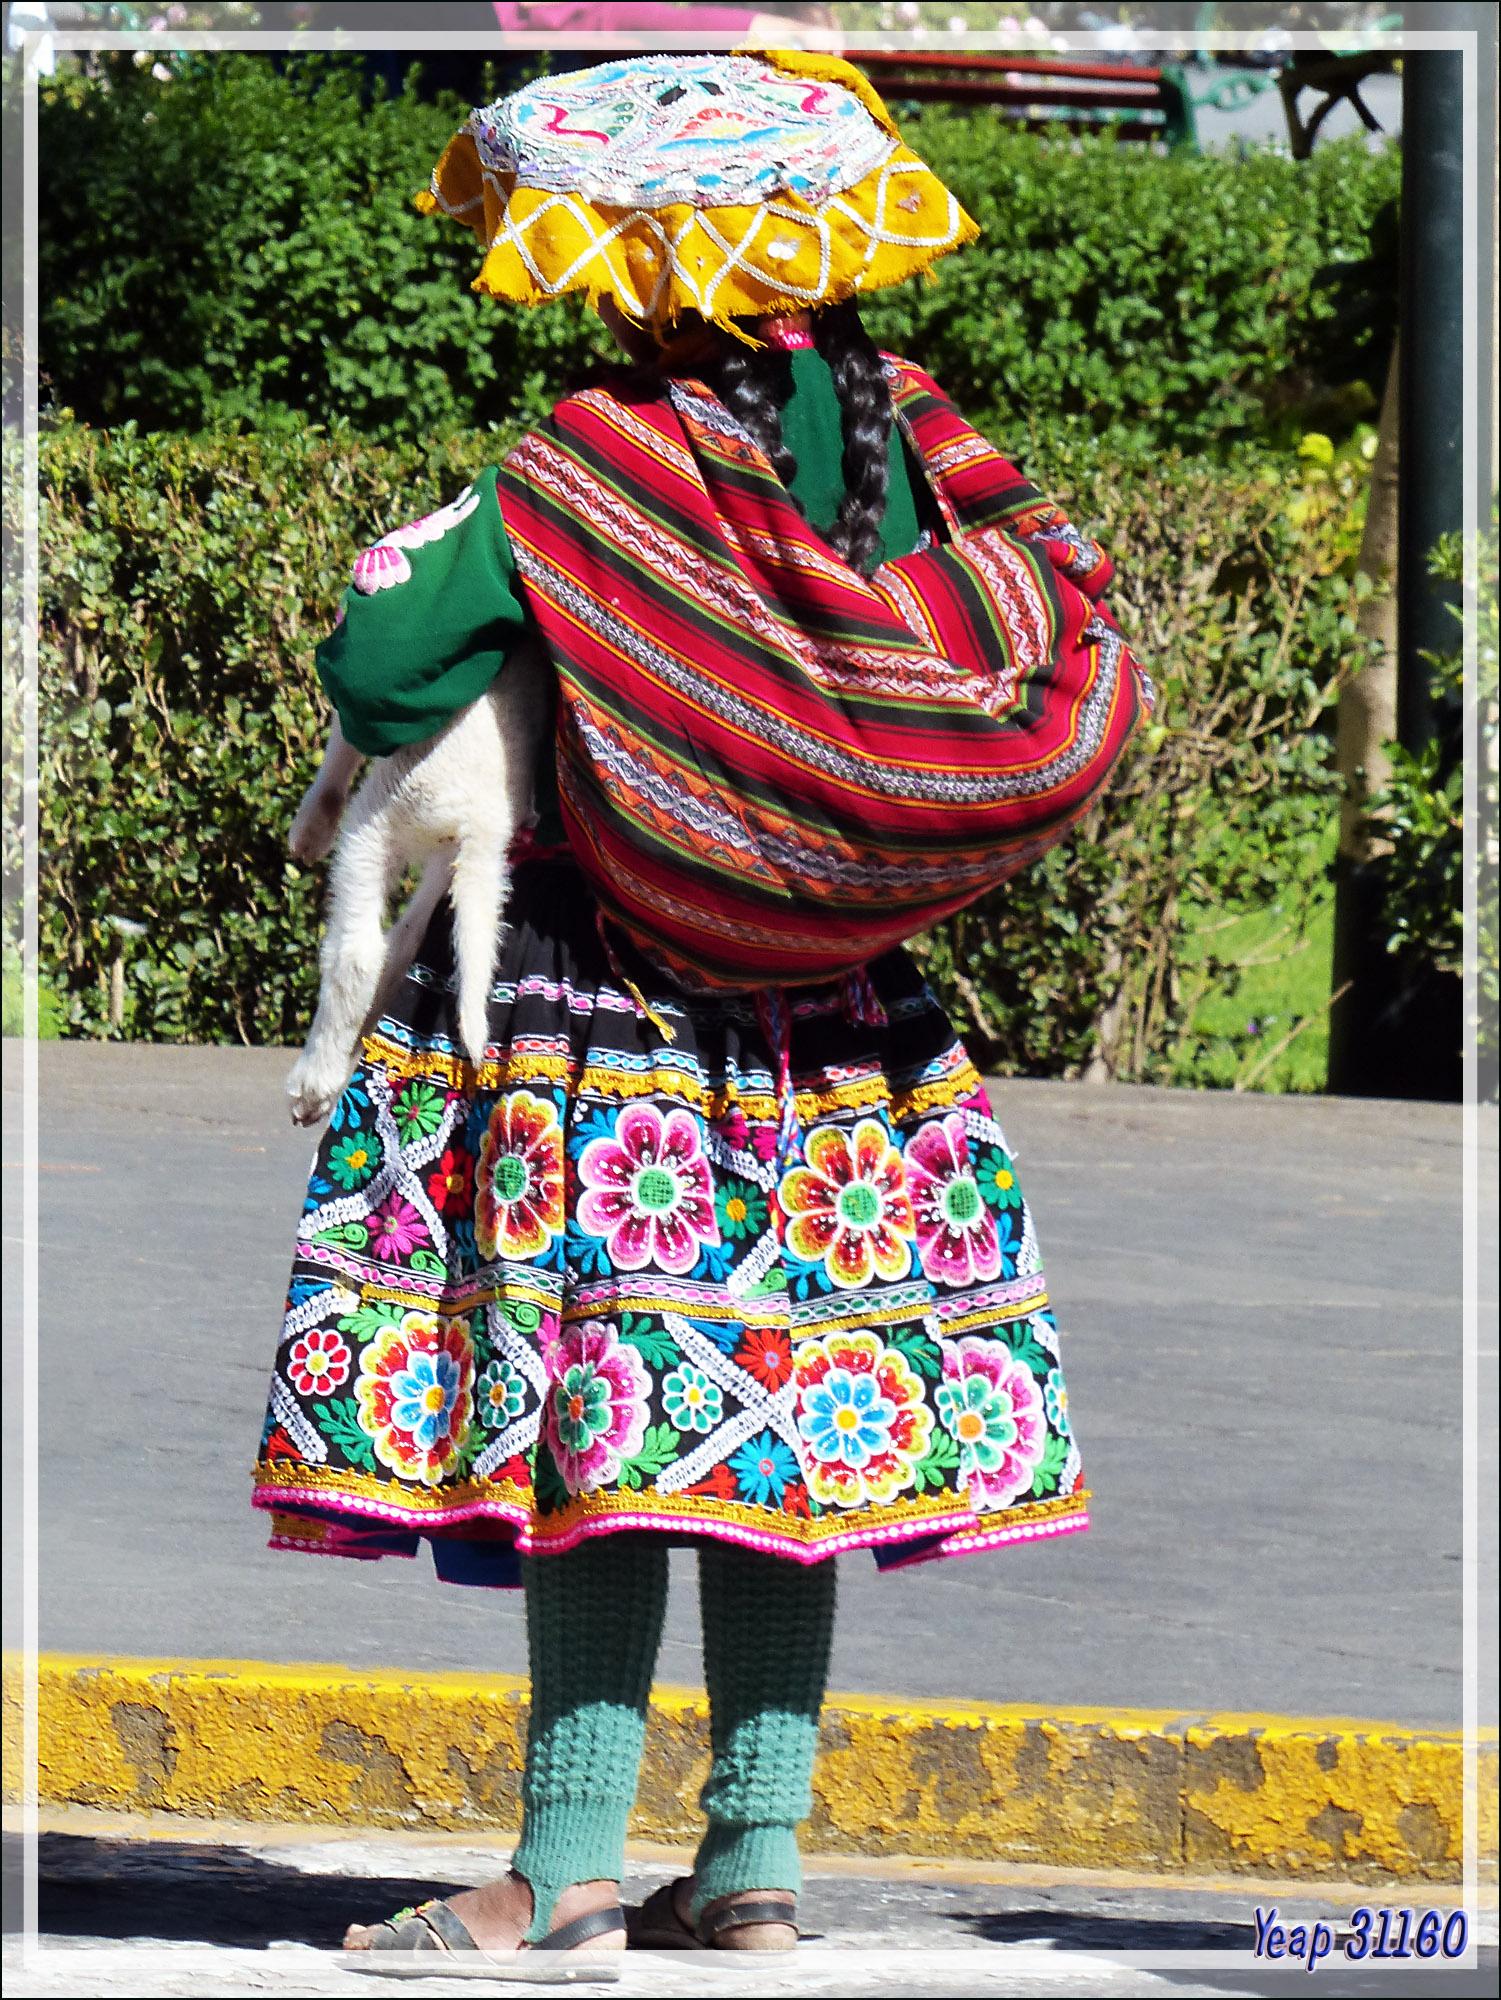 Peruvien Costume Traditionnel Femme Costume Photo Photo rsxdCthQ